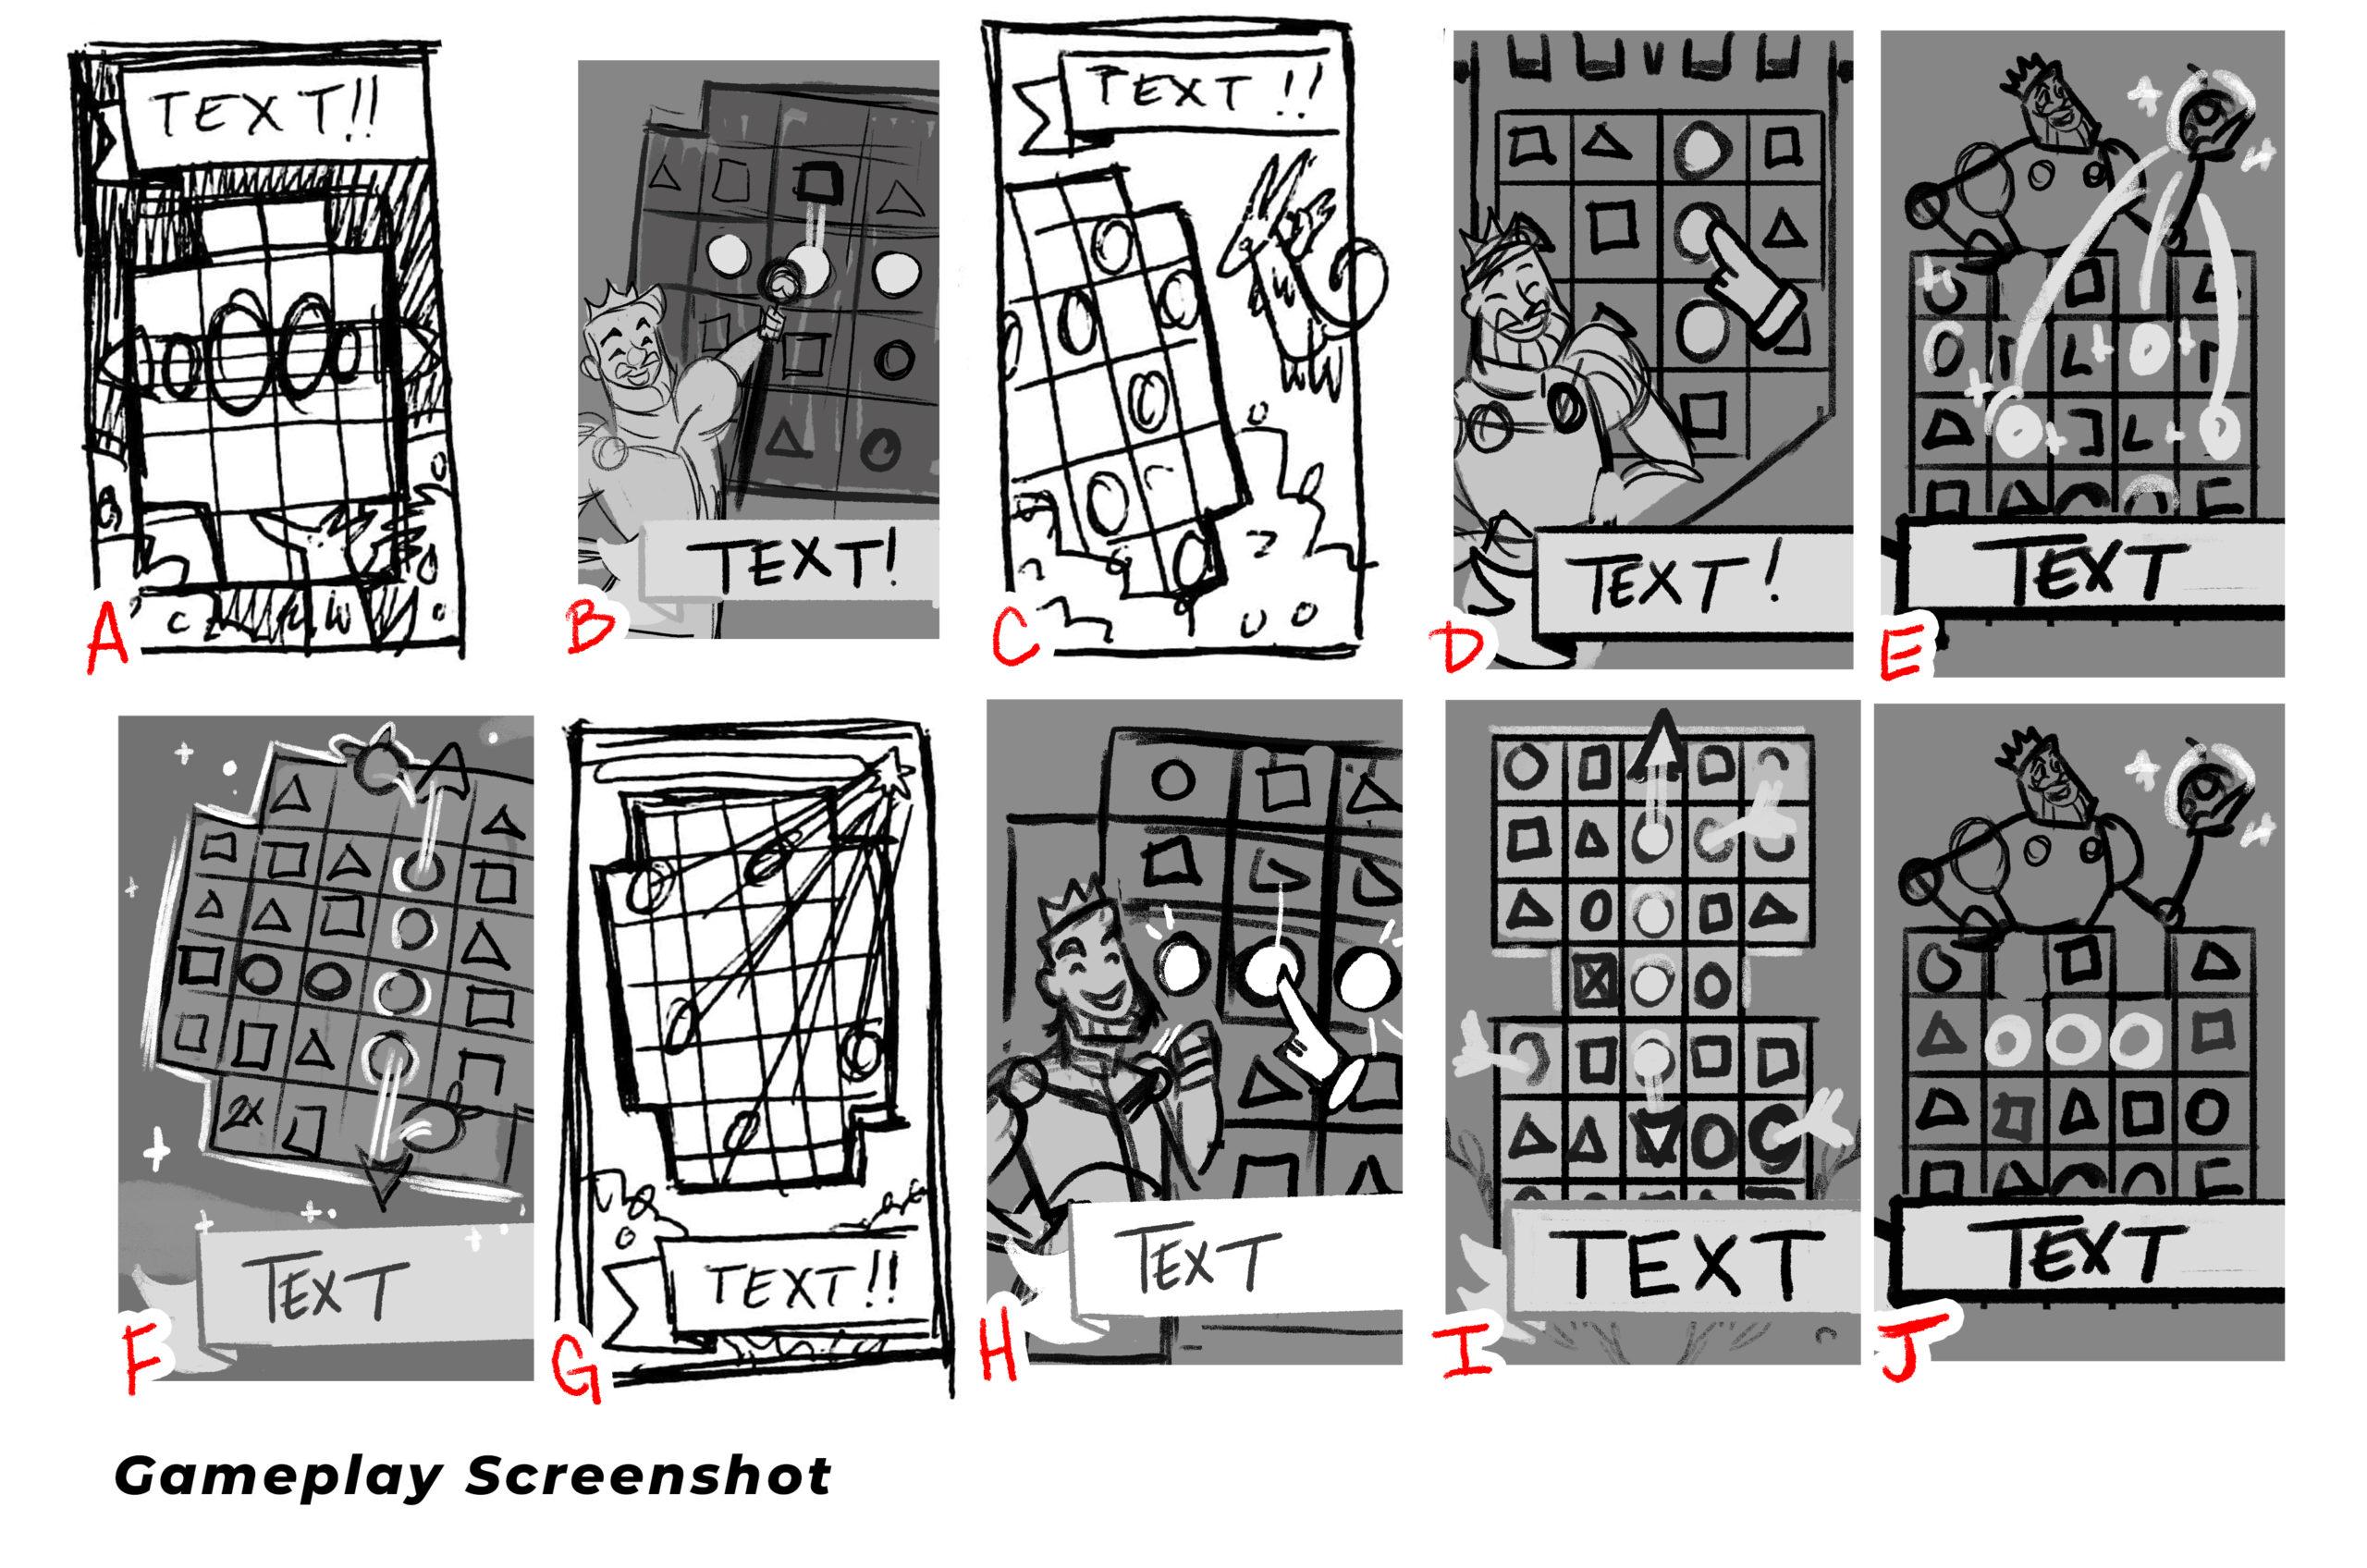 gameplayScreenshot